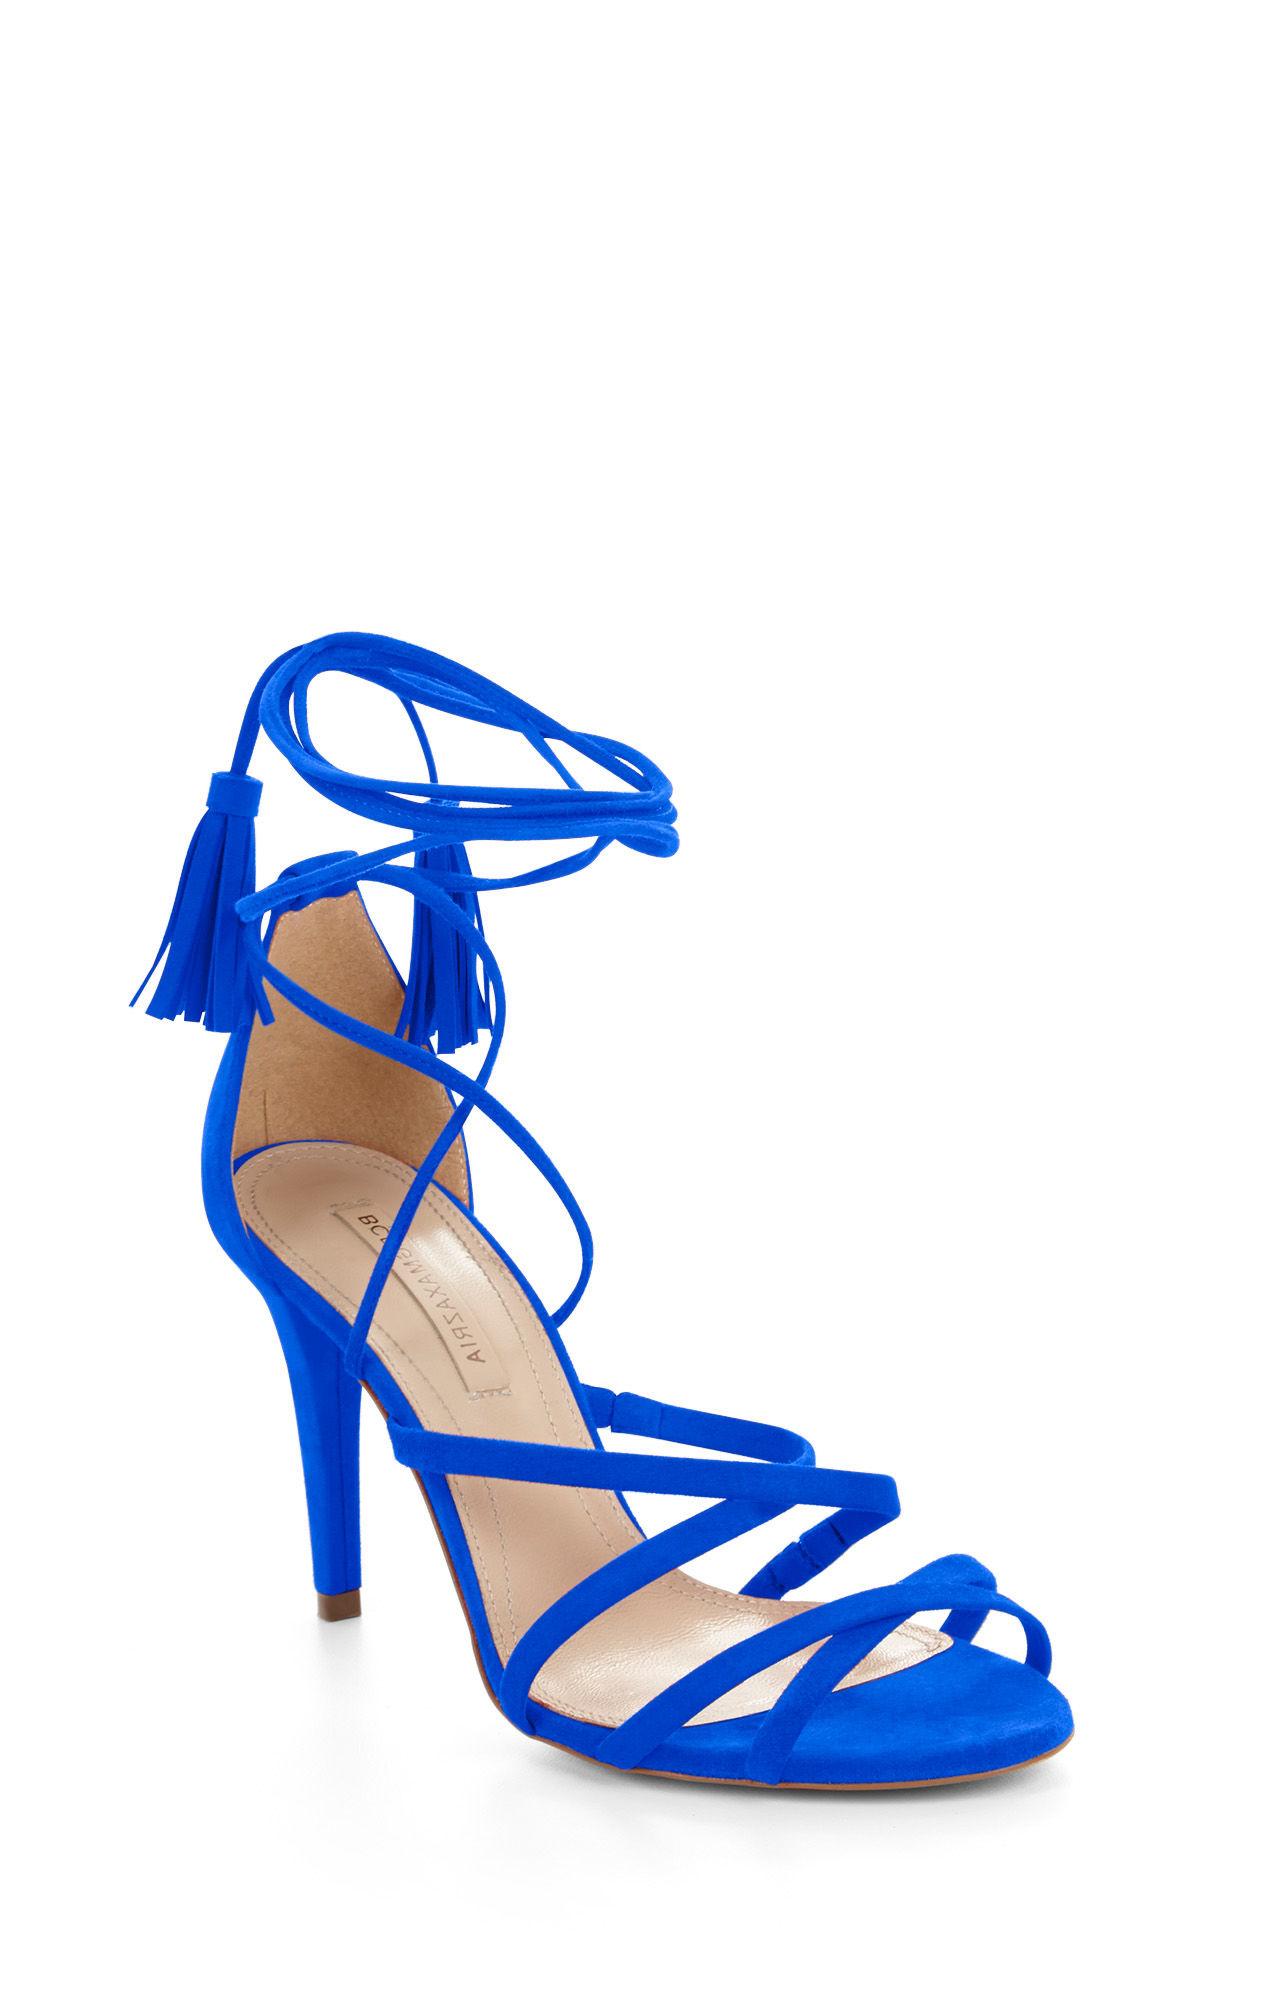 cb4e430aa8ac Bcbgmaxazria Lenita High-heel Suede Strappy Sandal in Blue - Lyst